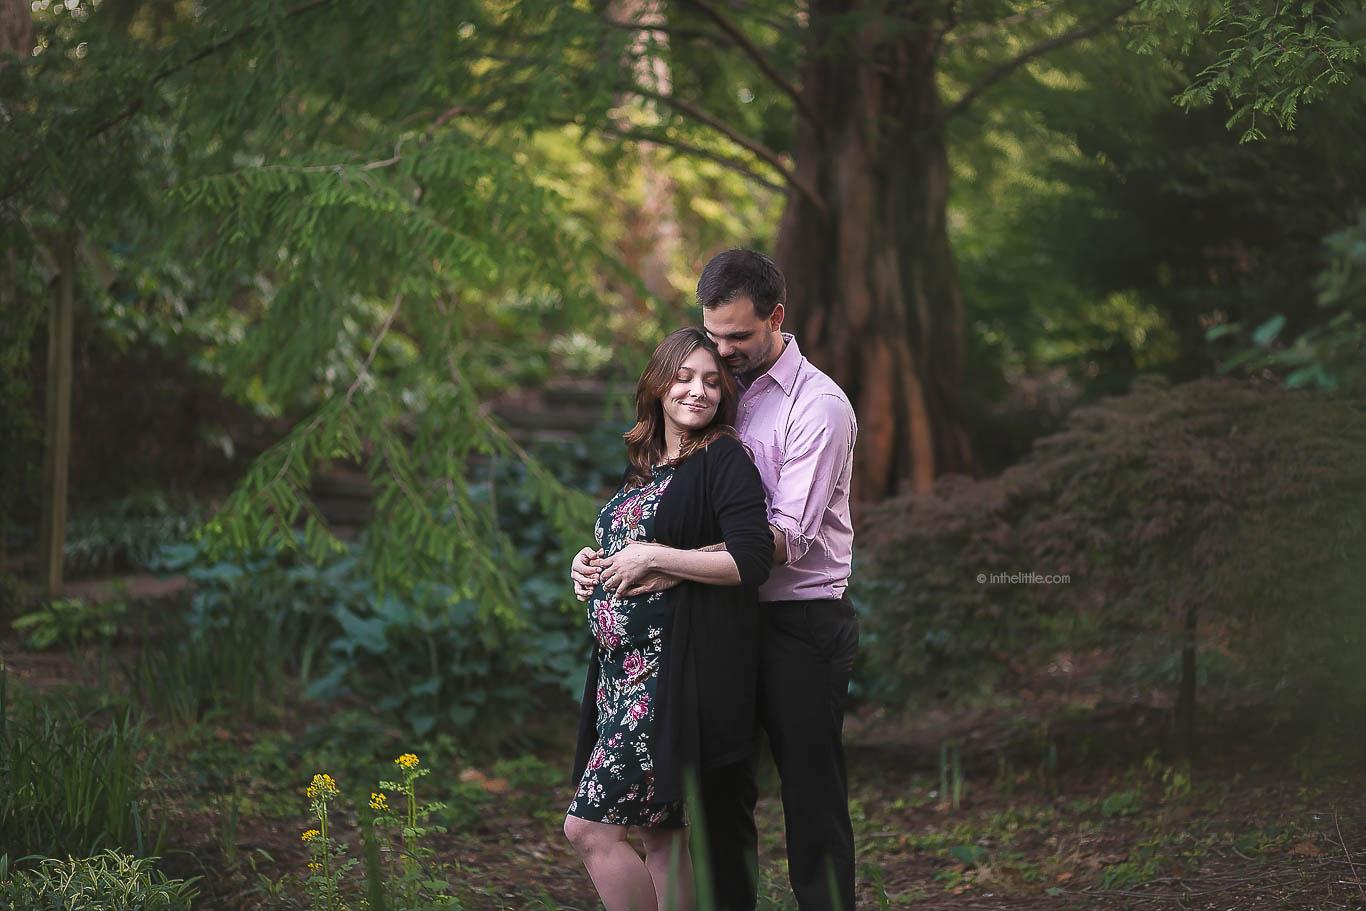 Pregnancy Photo Session Creve Coeur Missouri